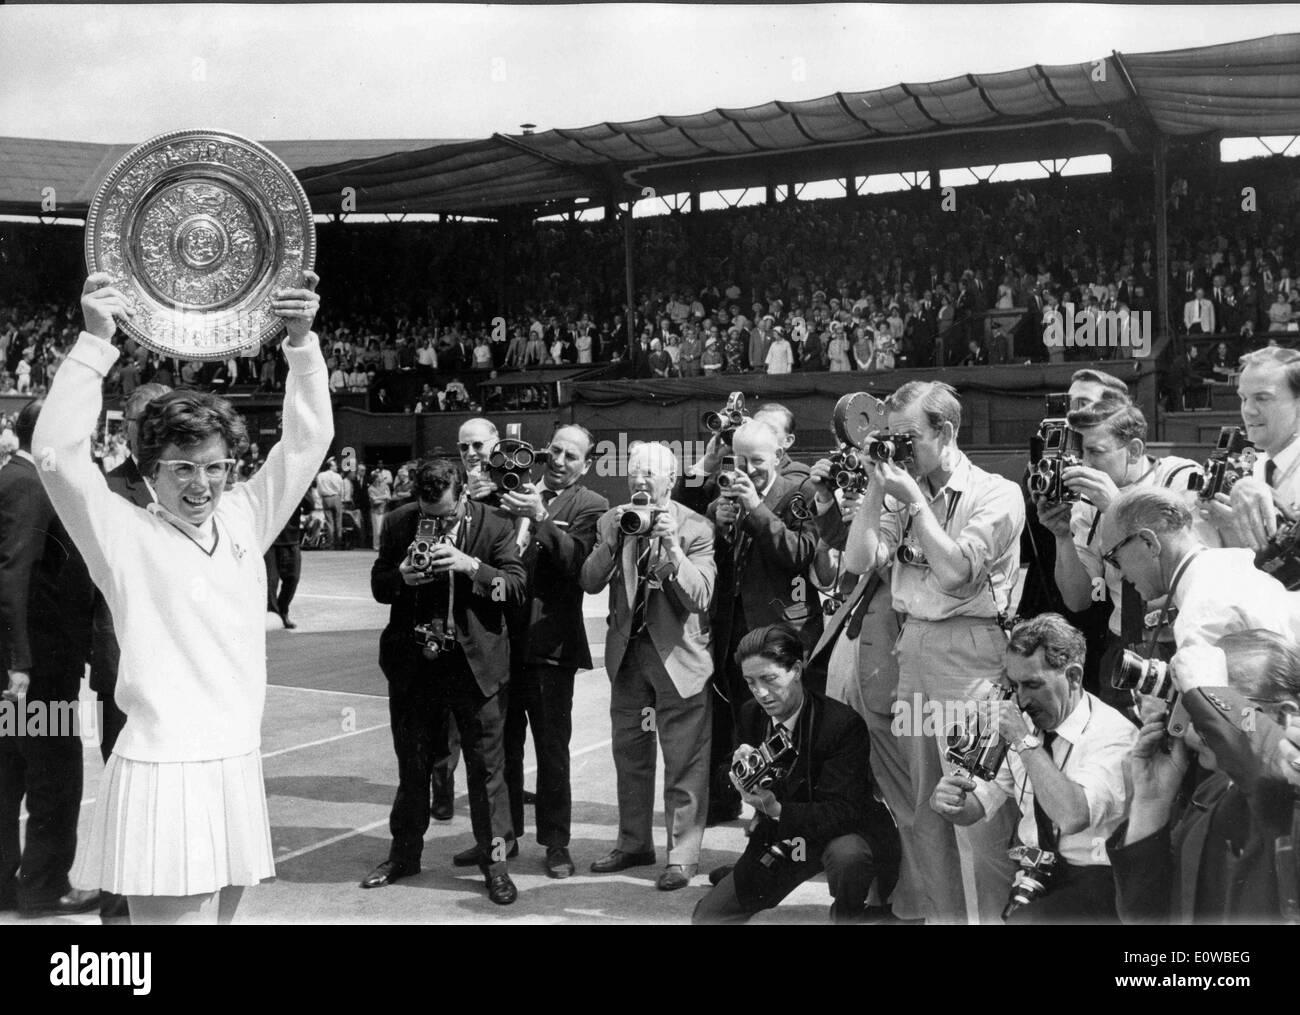 Watch Billie Jean King 12 Grand Slam singles titles video